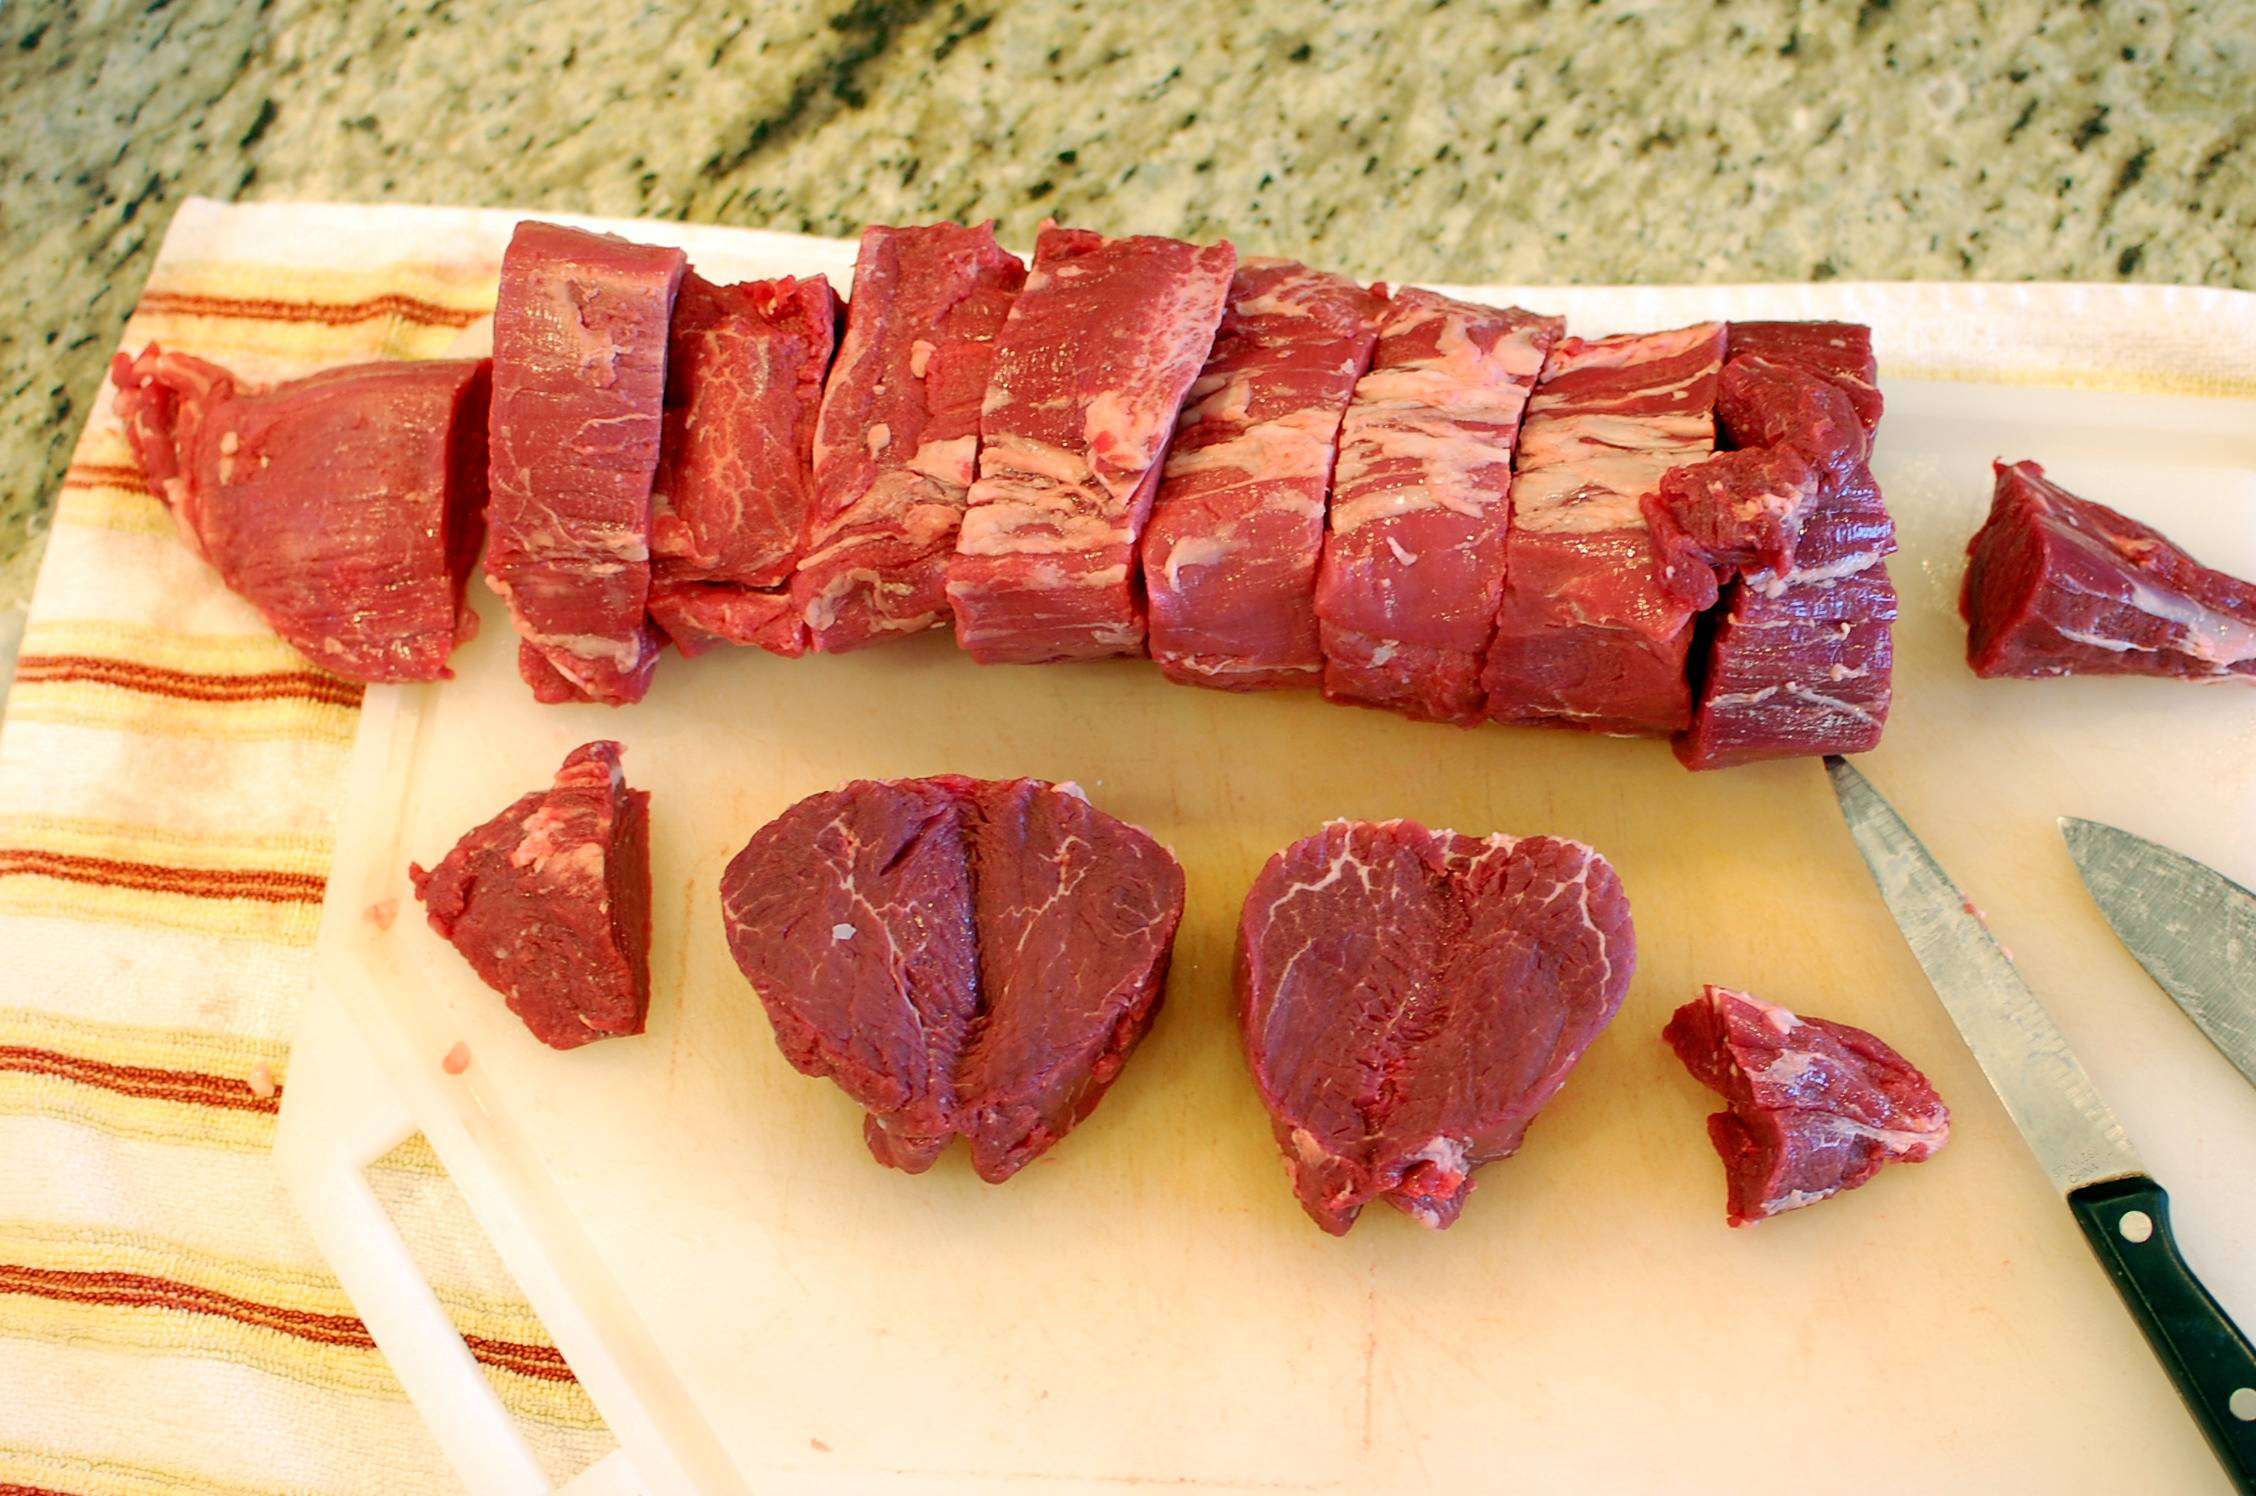 Beef Tenderloin Filet Mignon  How to butcher trim and cut a whole beef tenderloin a k